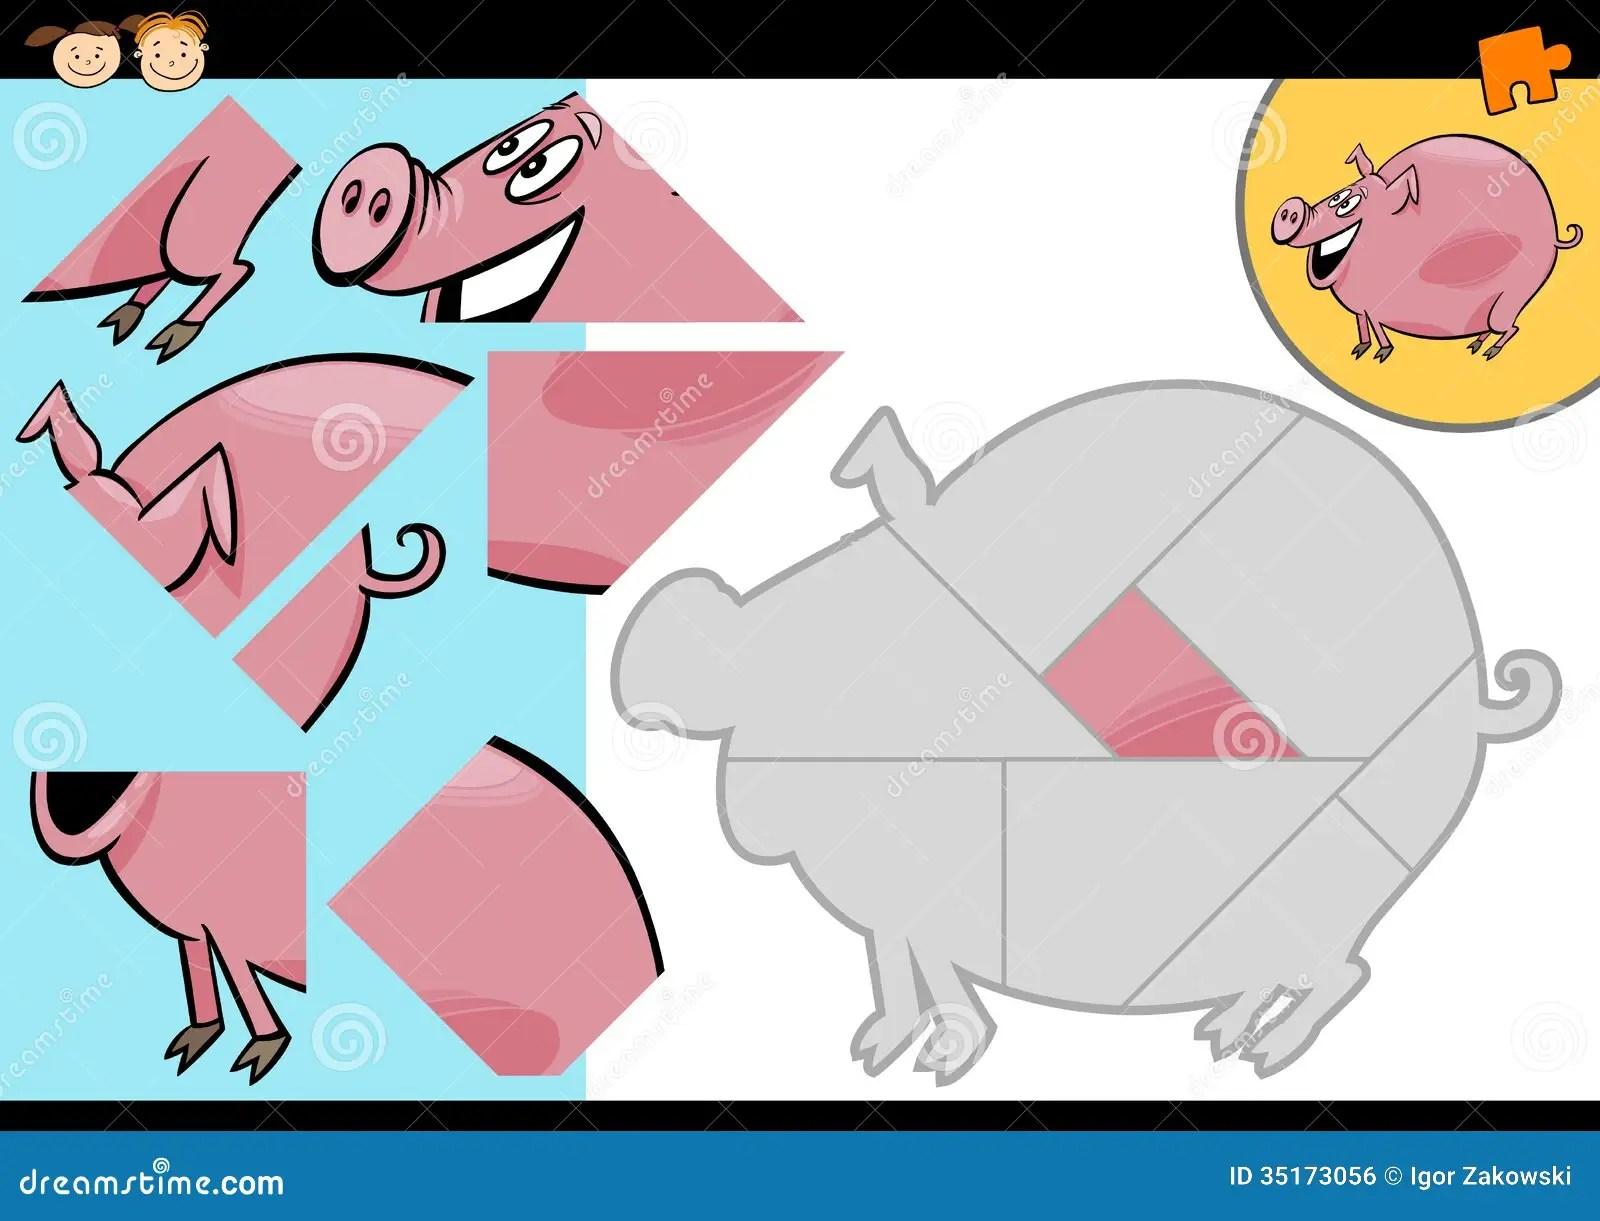 Cartoon Farm Pig Puzzle Game Royalty Free Stock Image